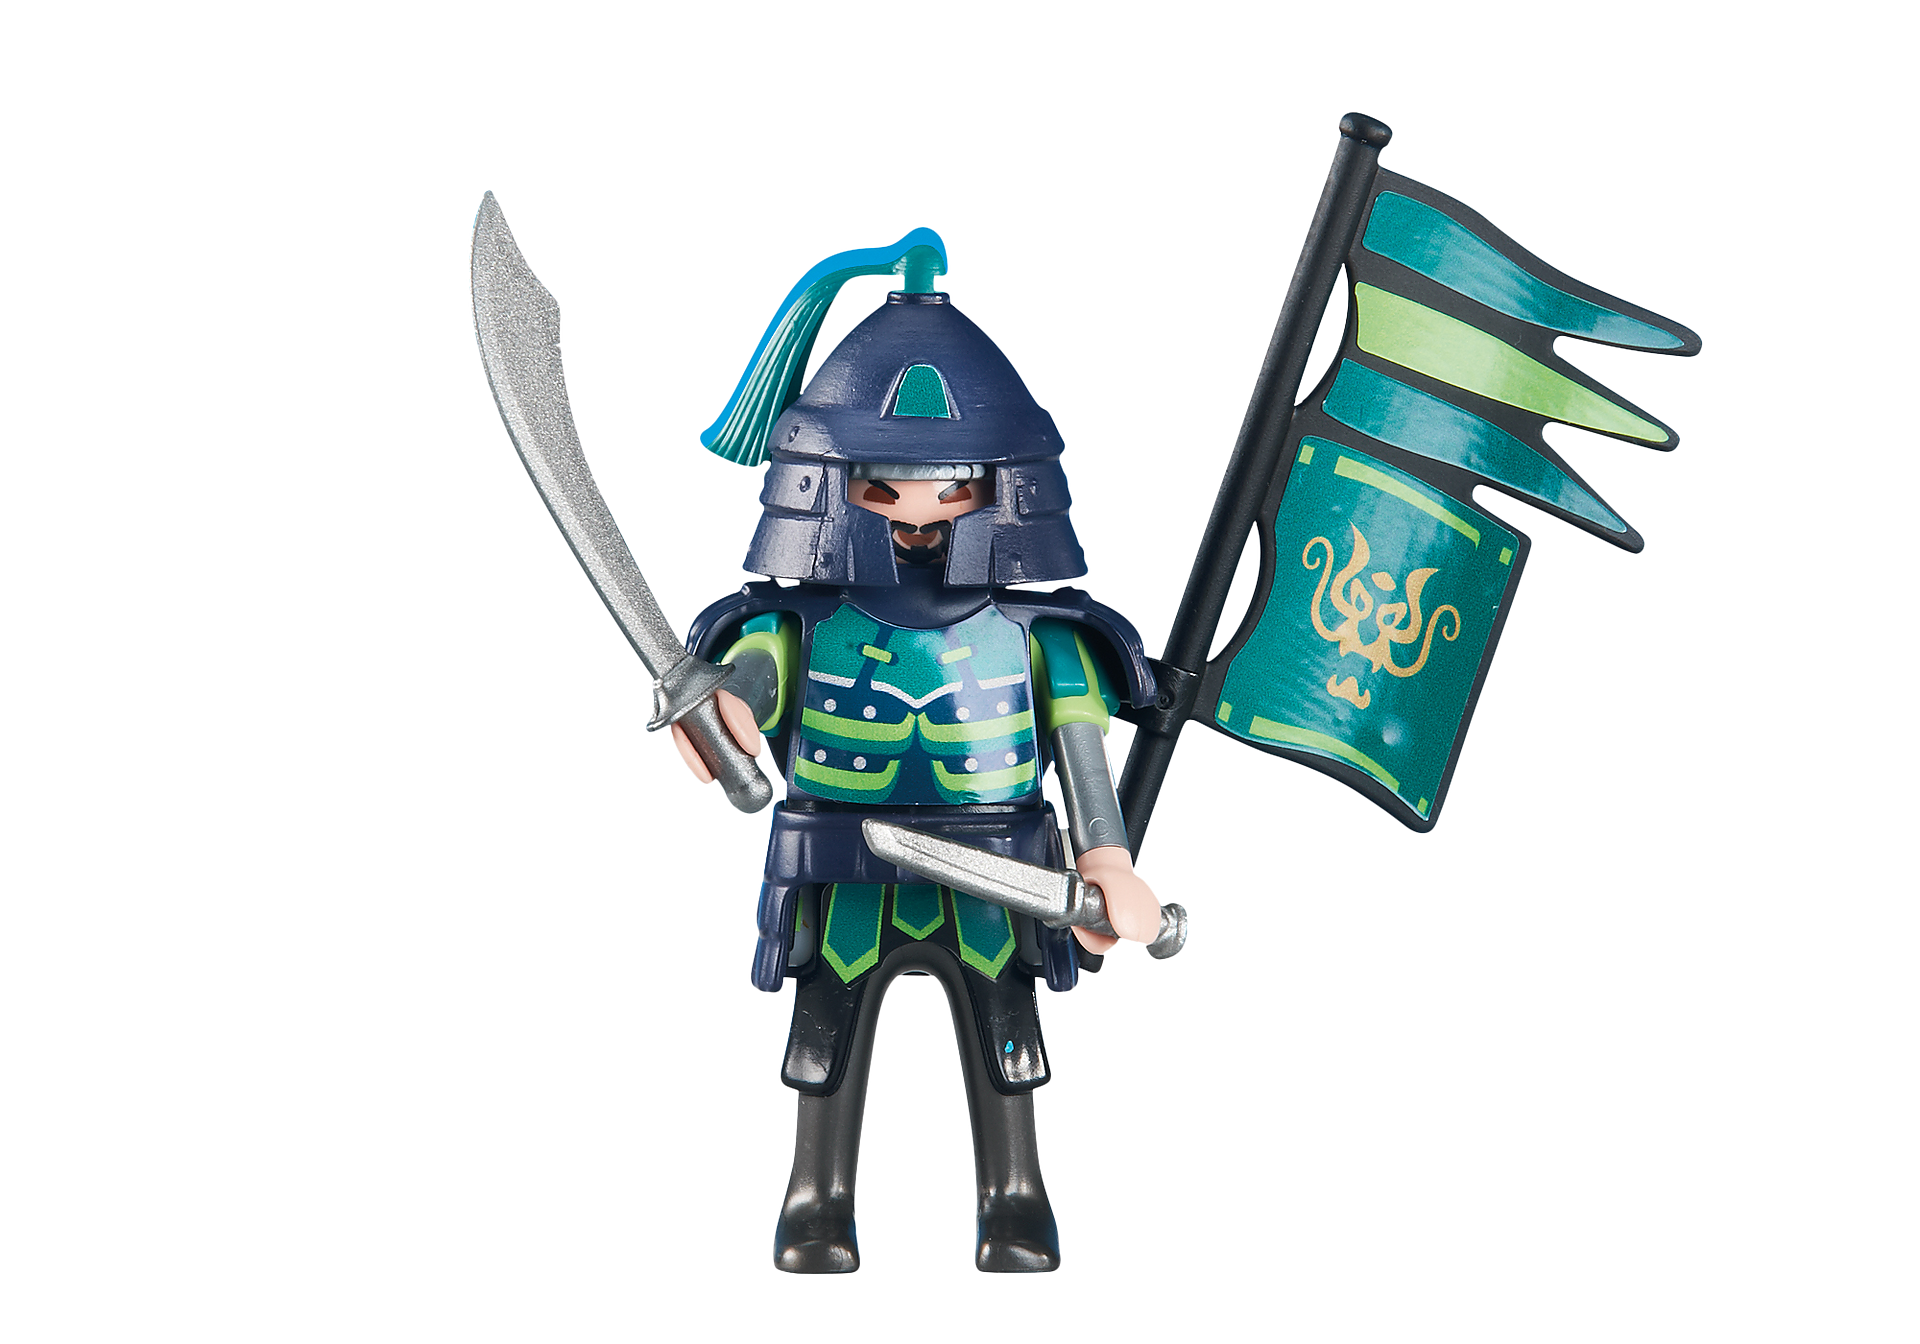 6327 Anführer der Grünen Asia-Ritter zoom image1